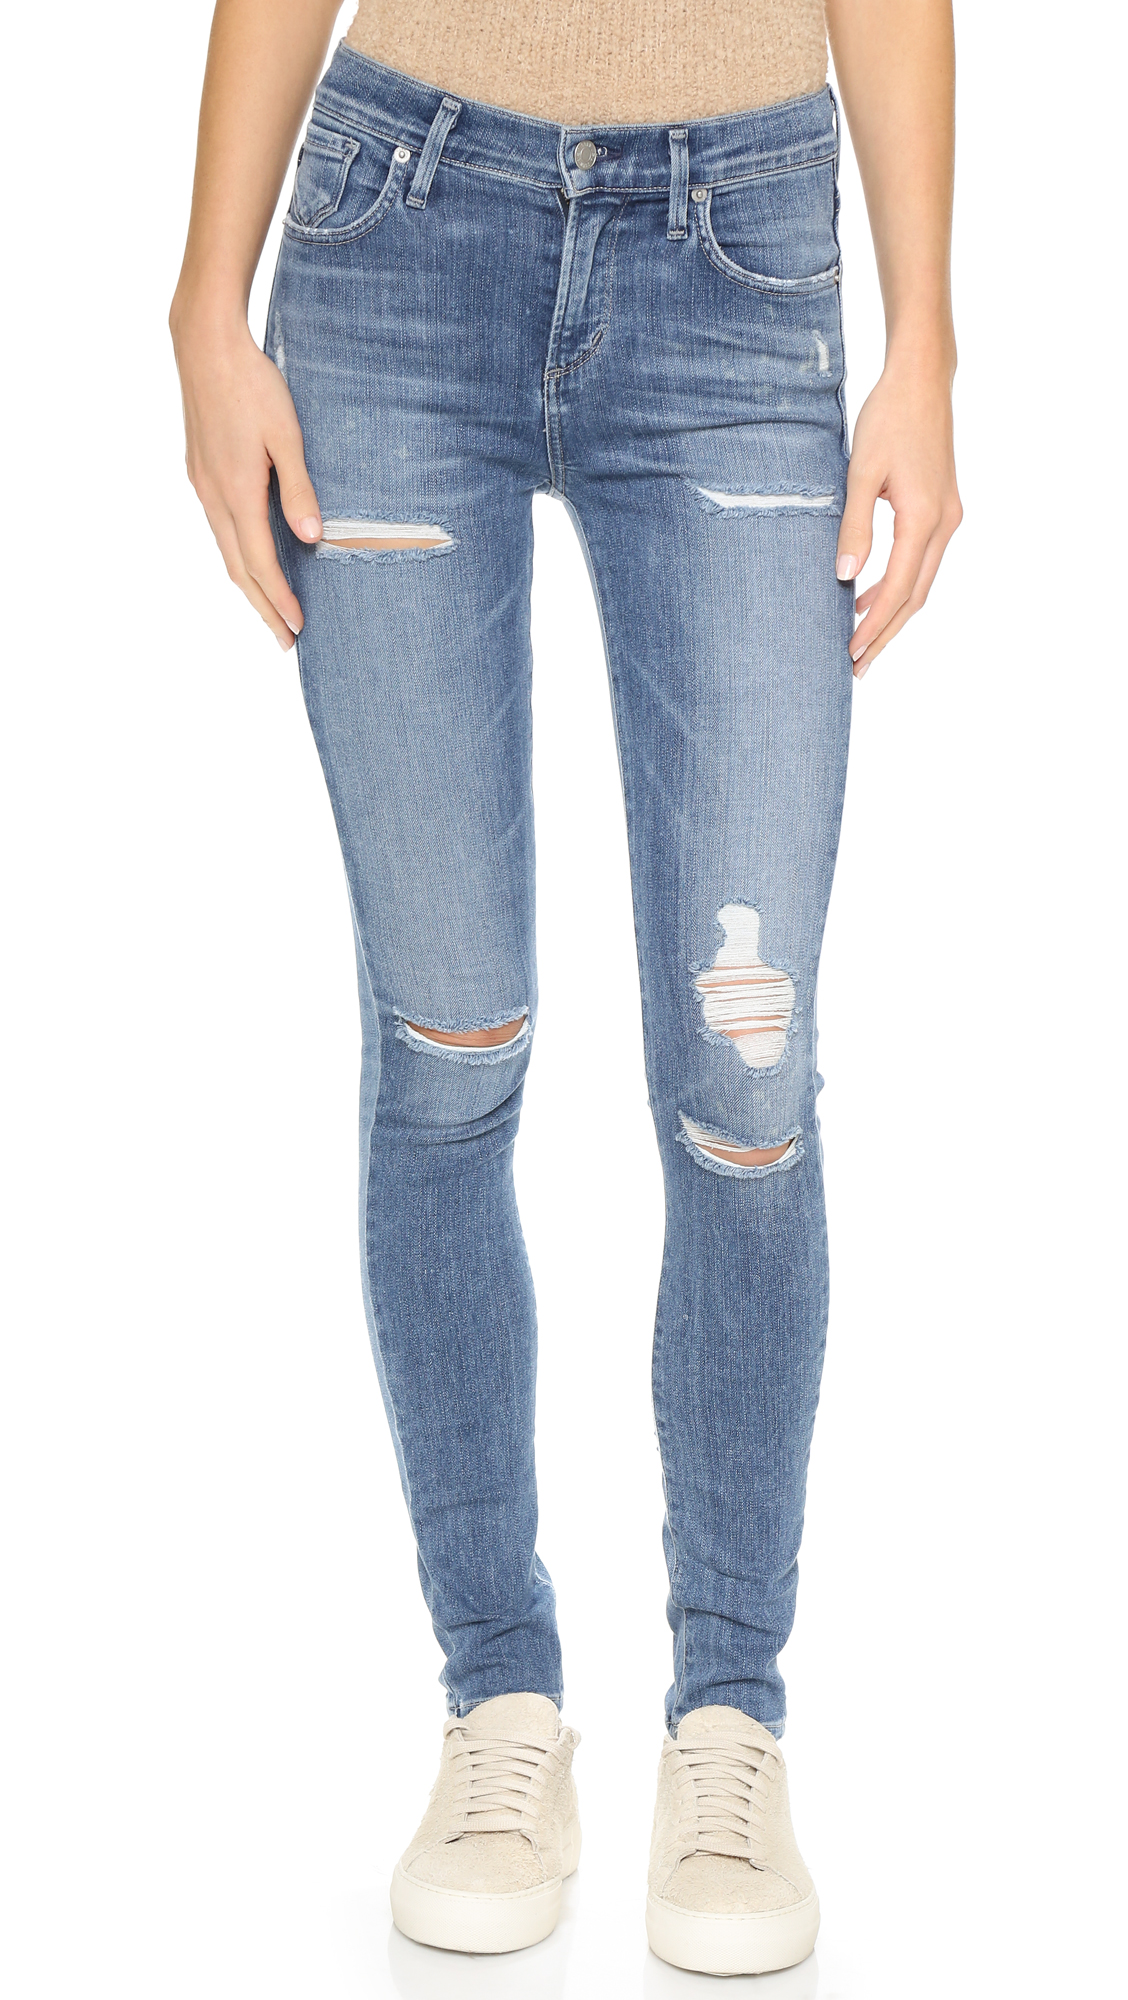 Agolde Sophie Skinny Jeans - Cannes at Shopbop